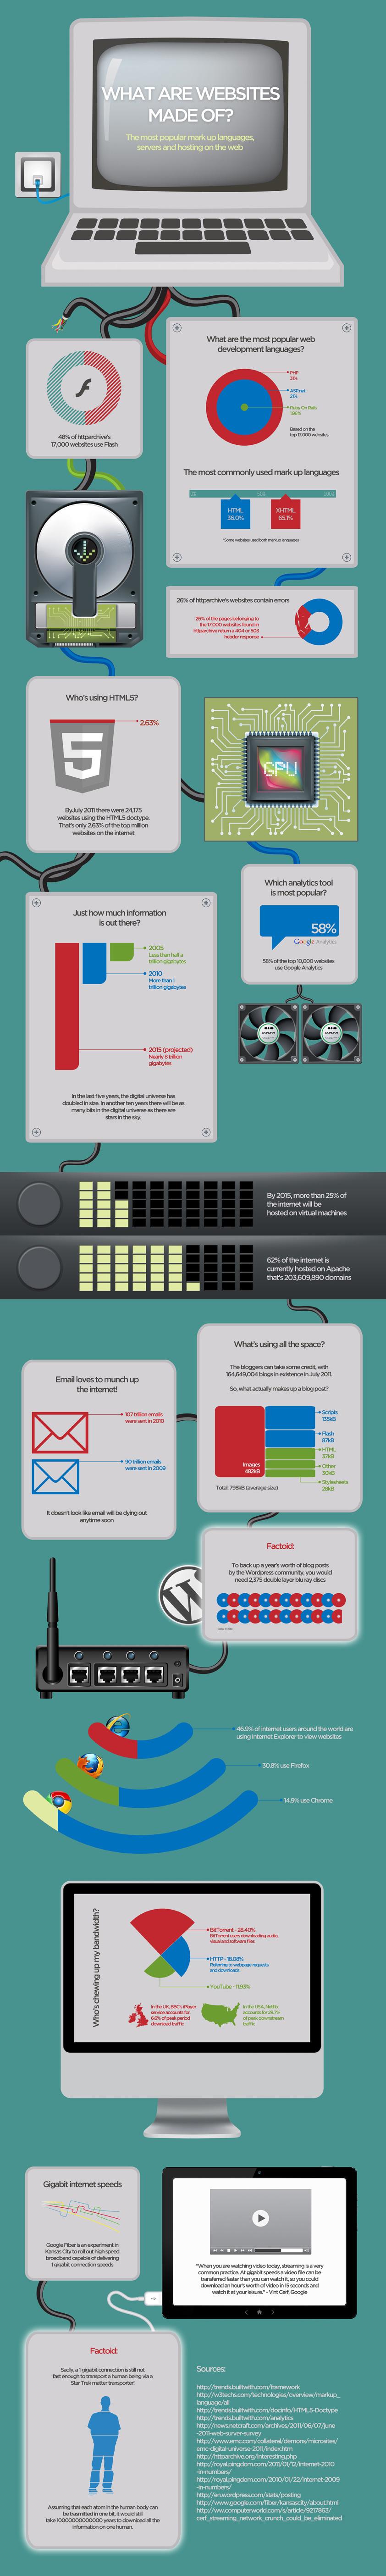 Best Infographics on Web Design And Development